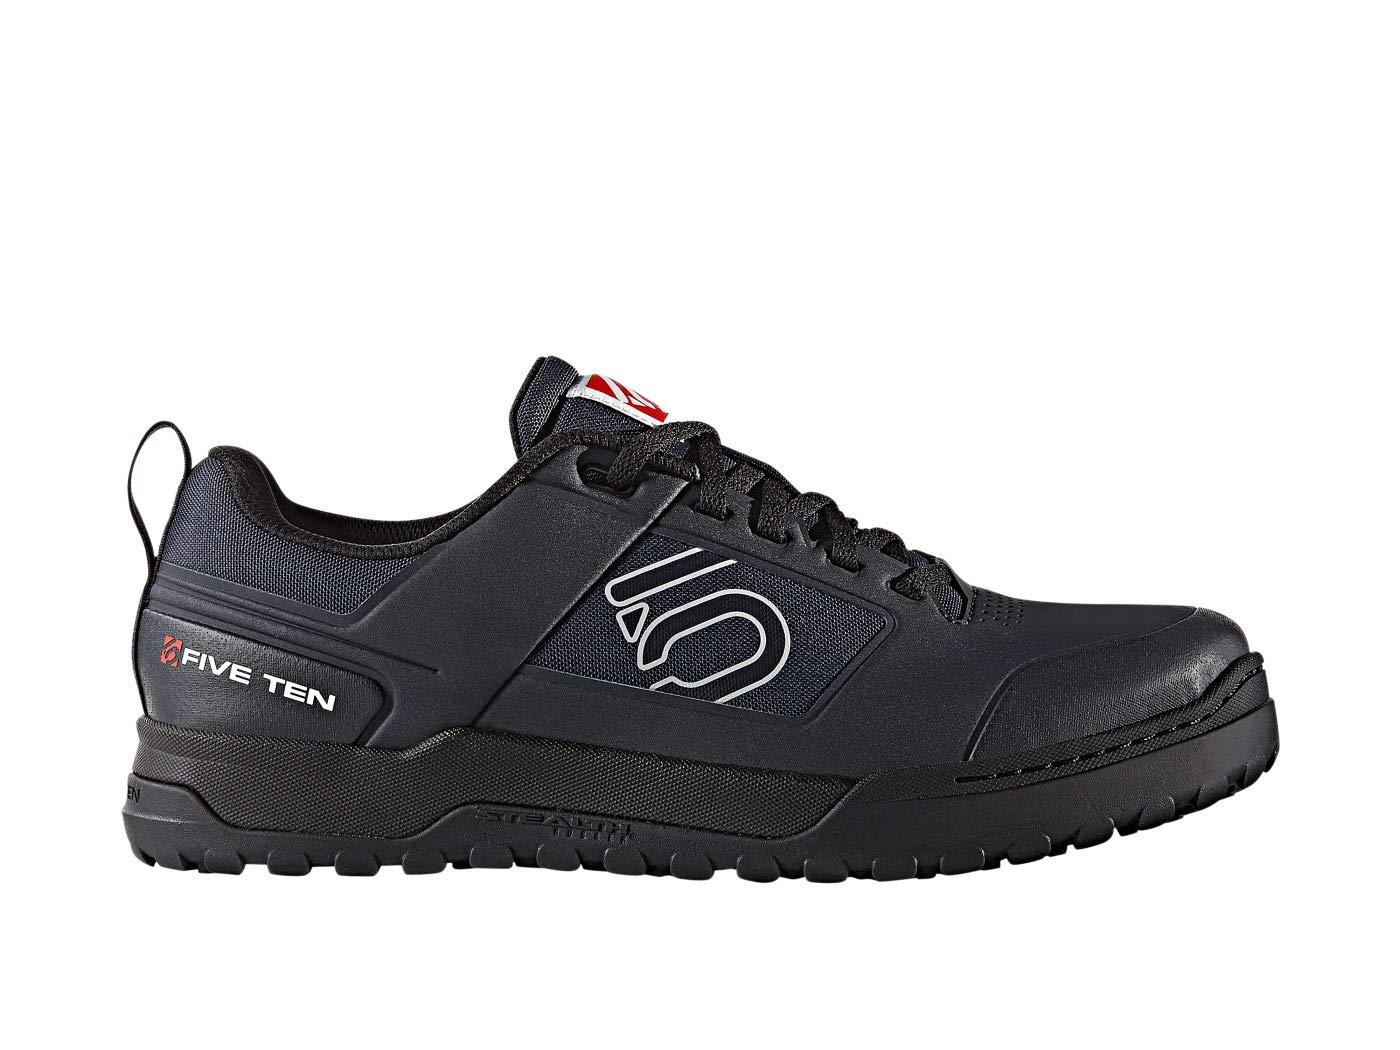 Five Ten MTB-Schuhe Impact PRO Blau 2018